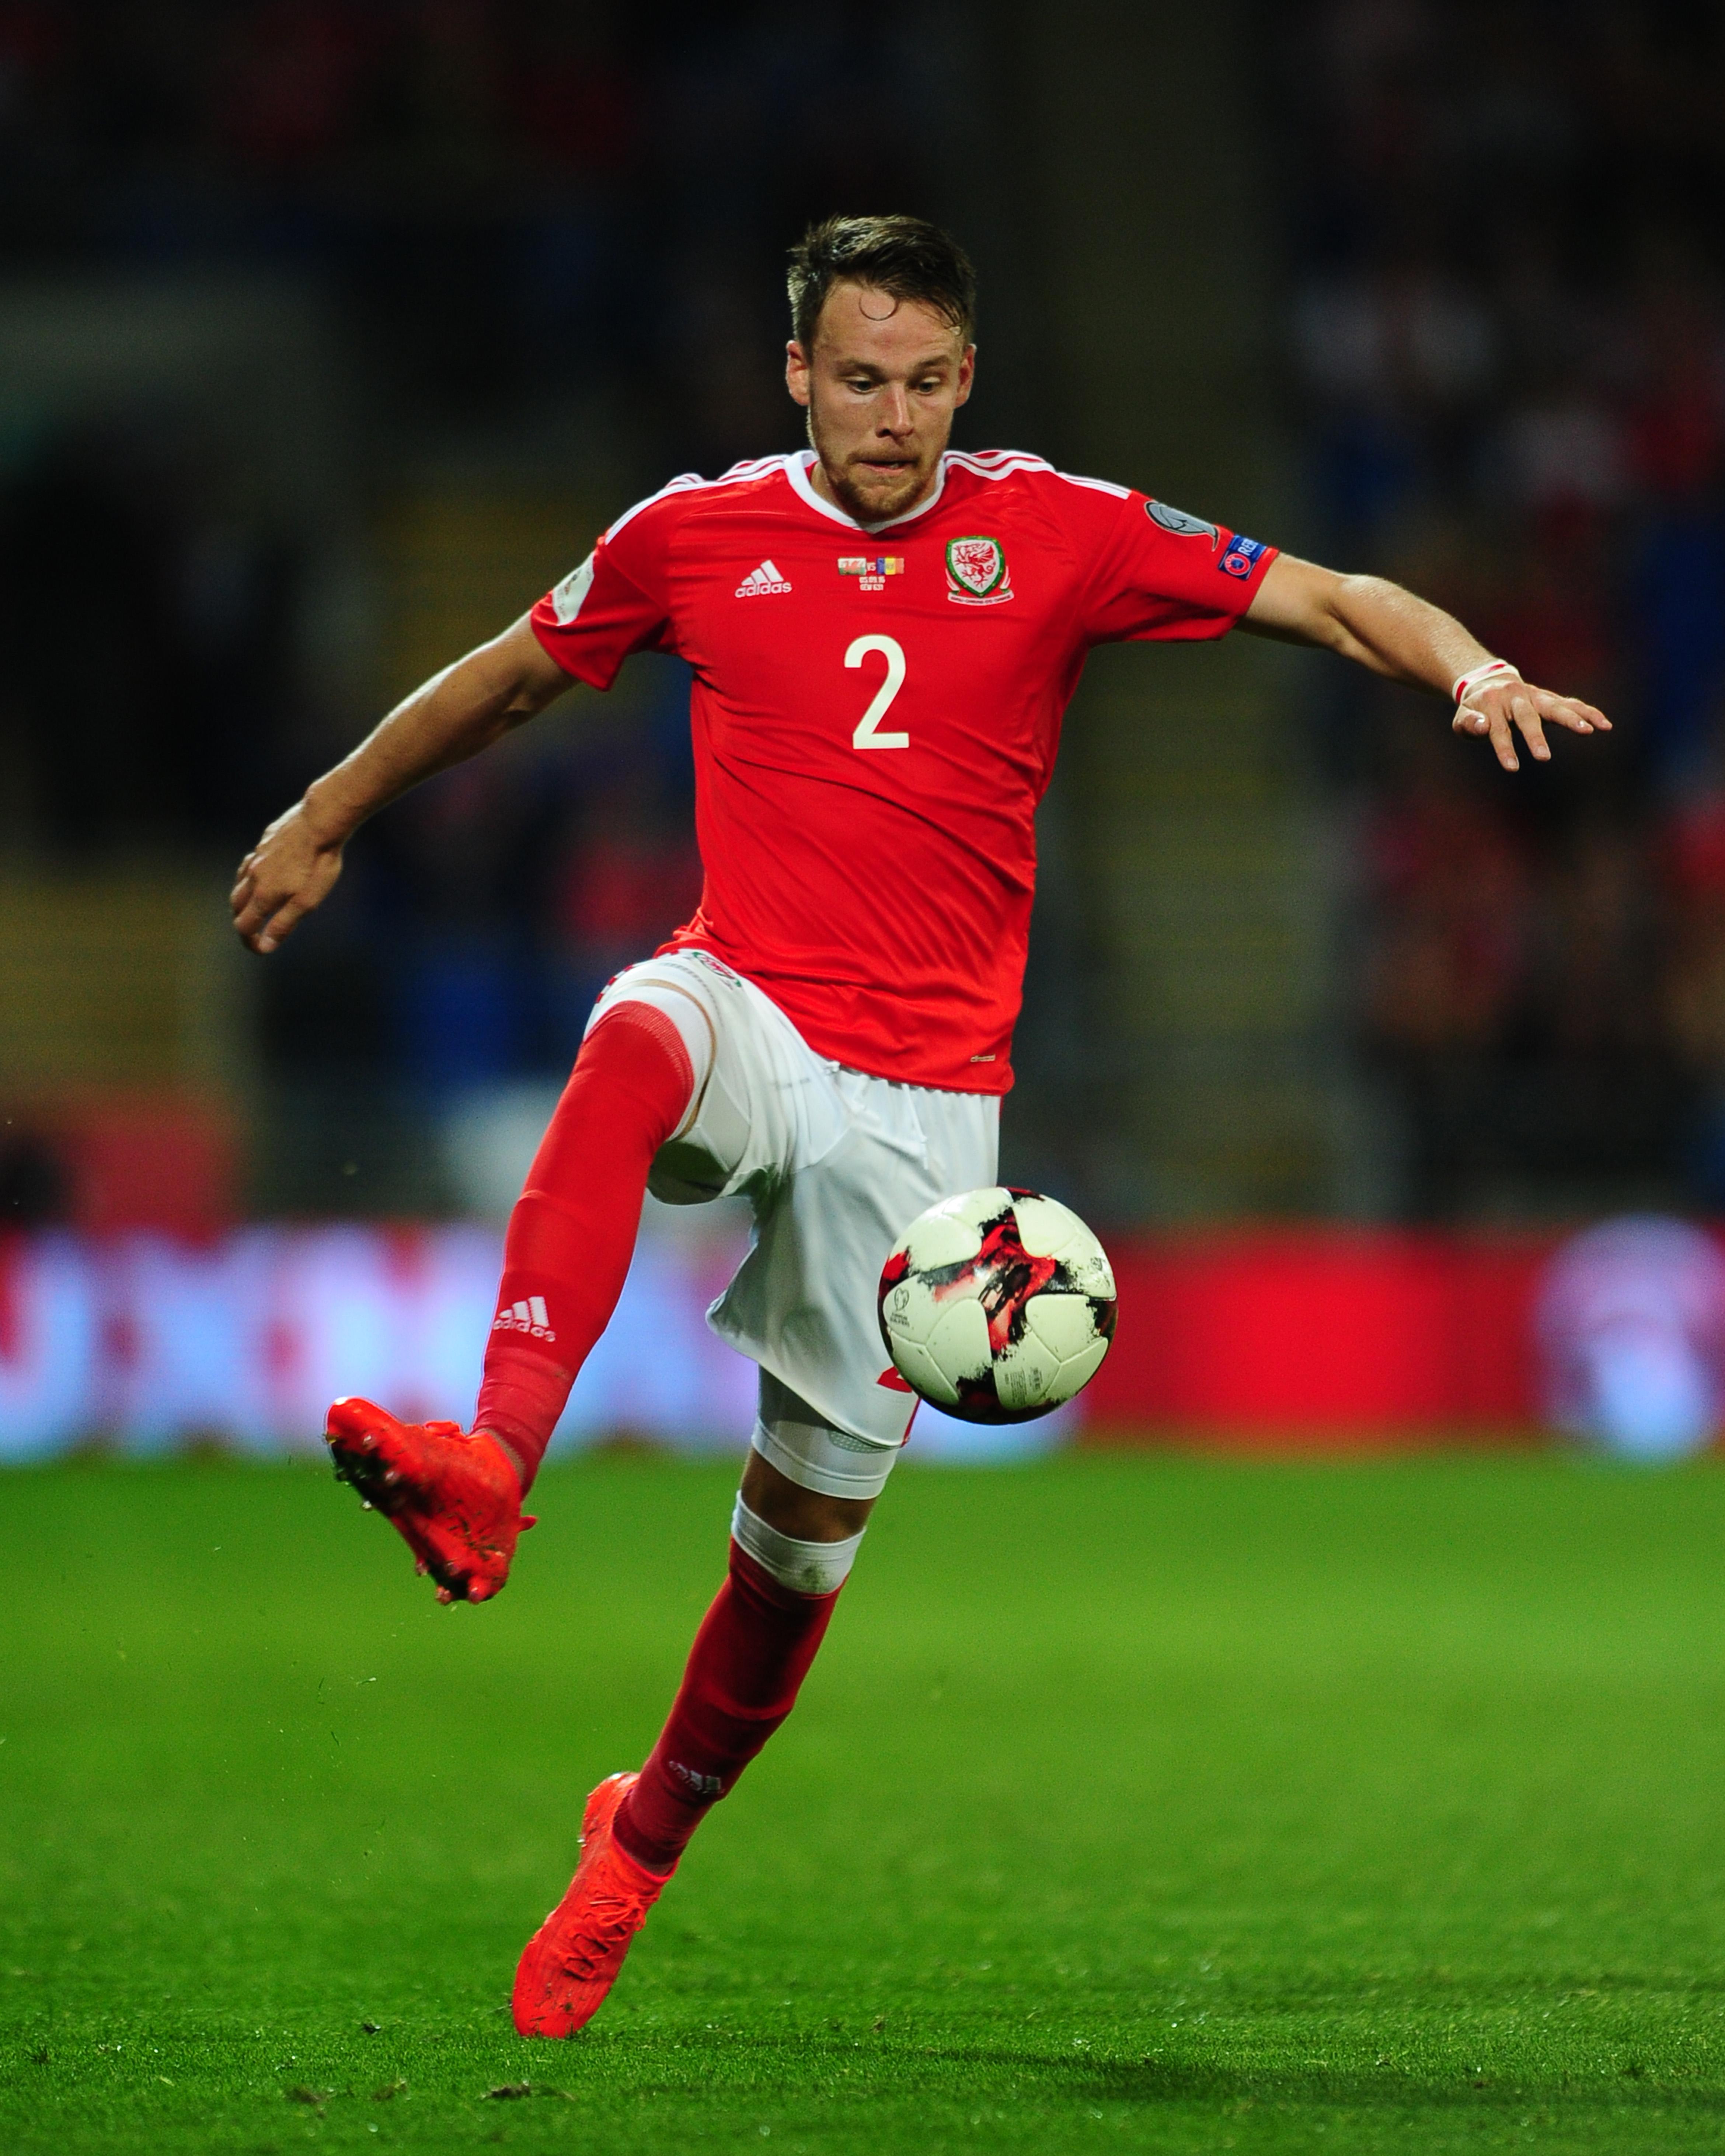 Wales v Moldova - 2018 FIFA World Cup Qualifier